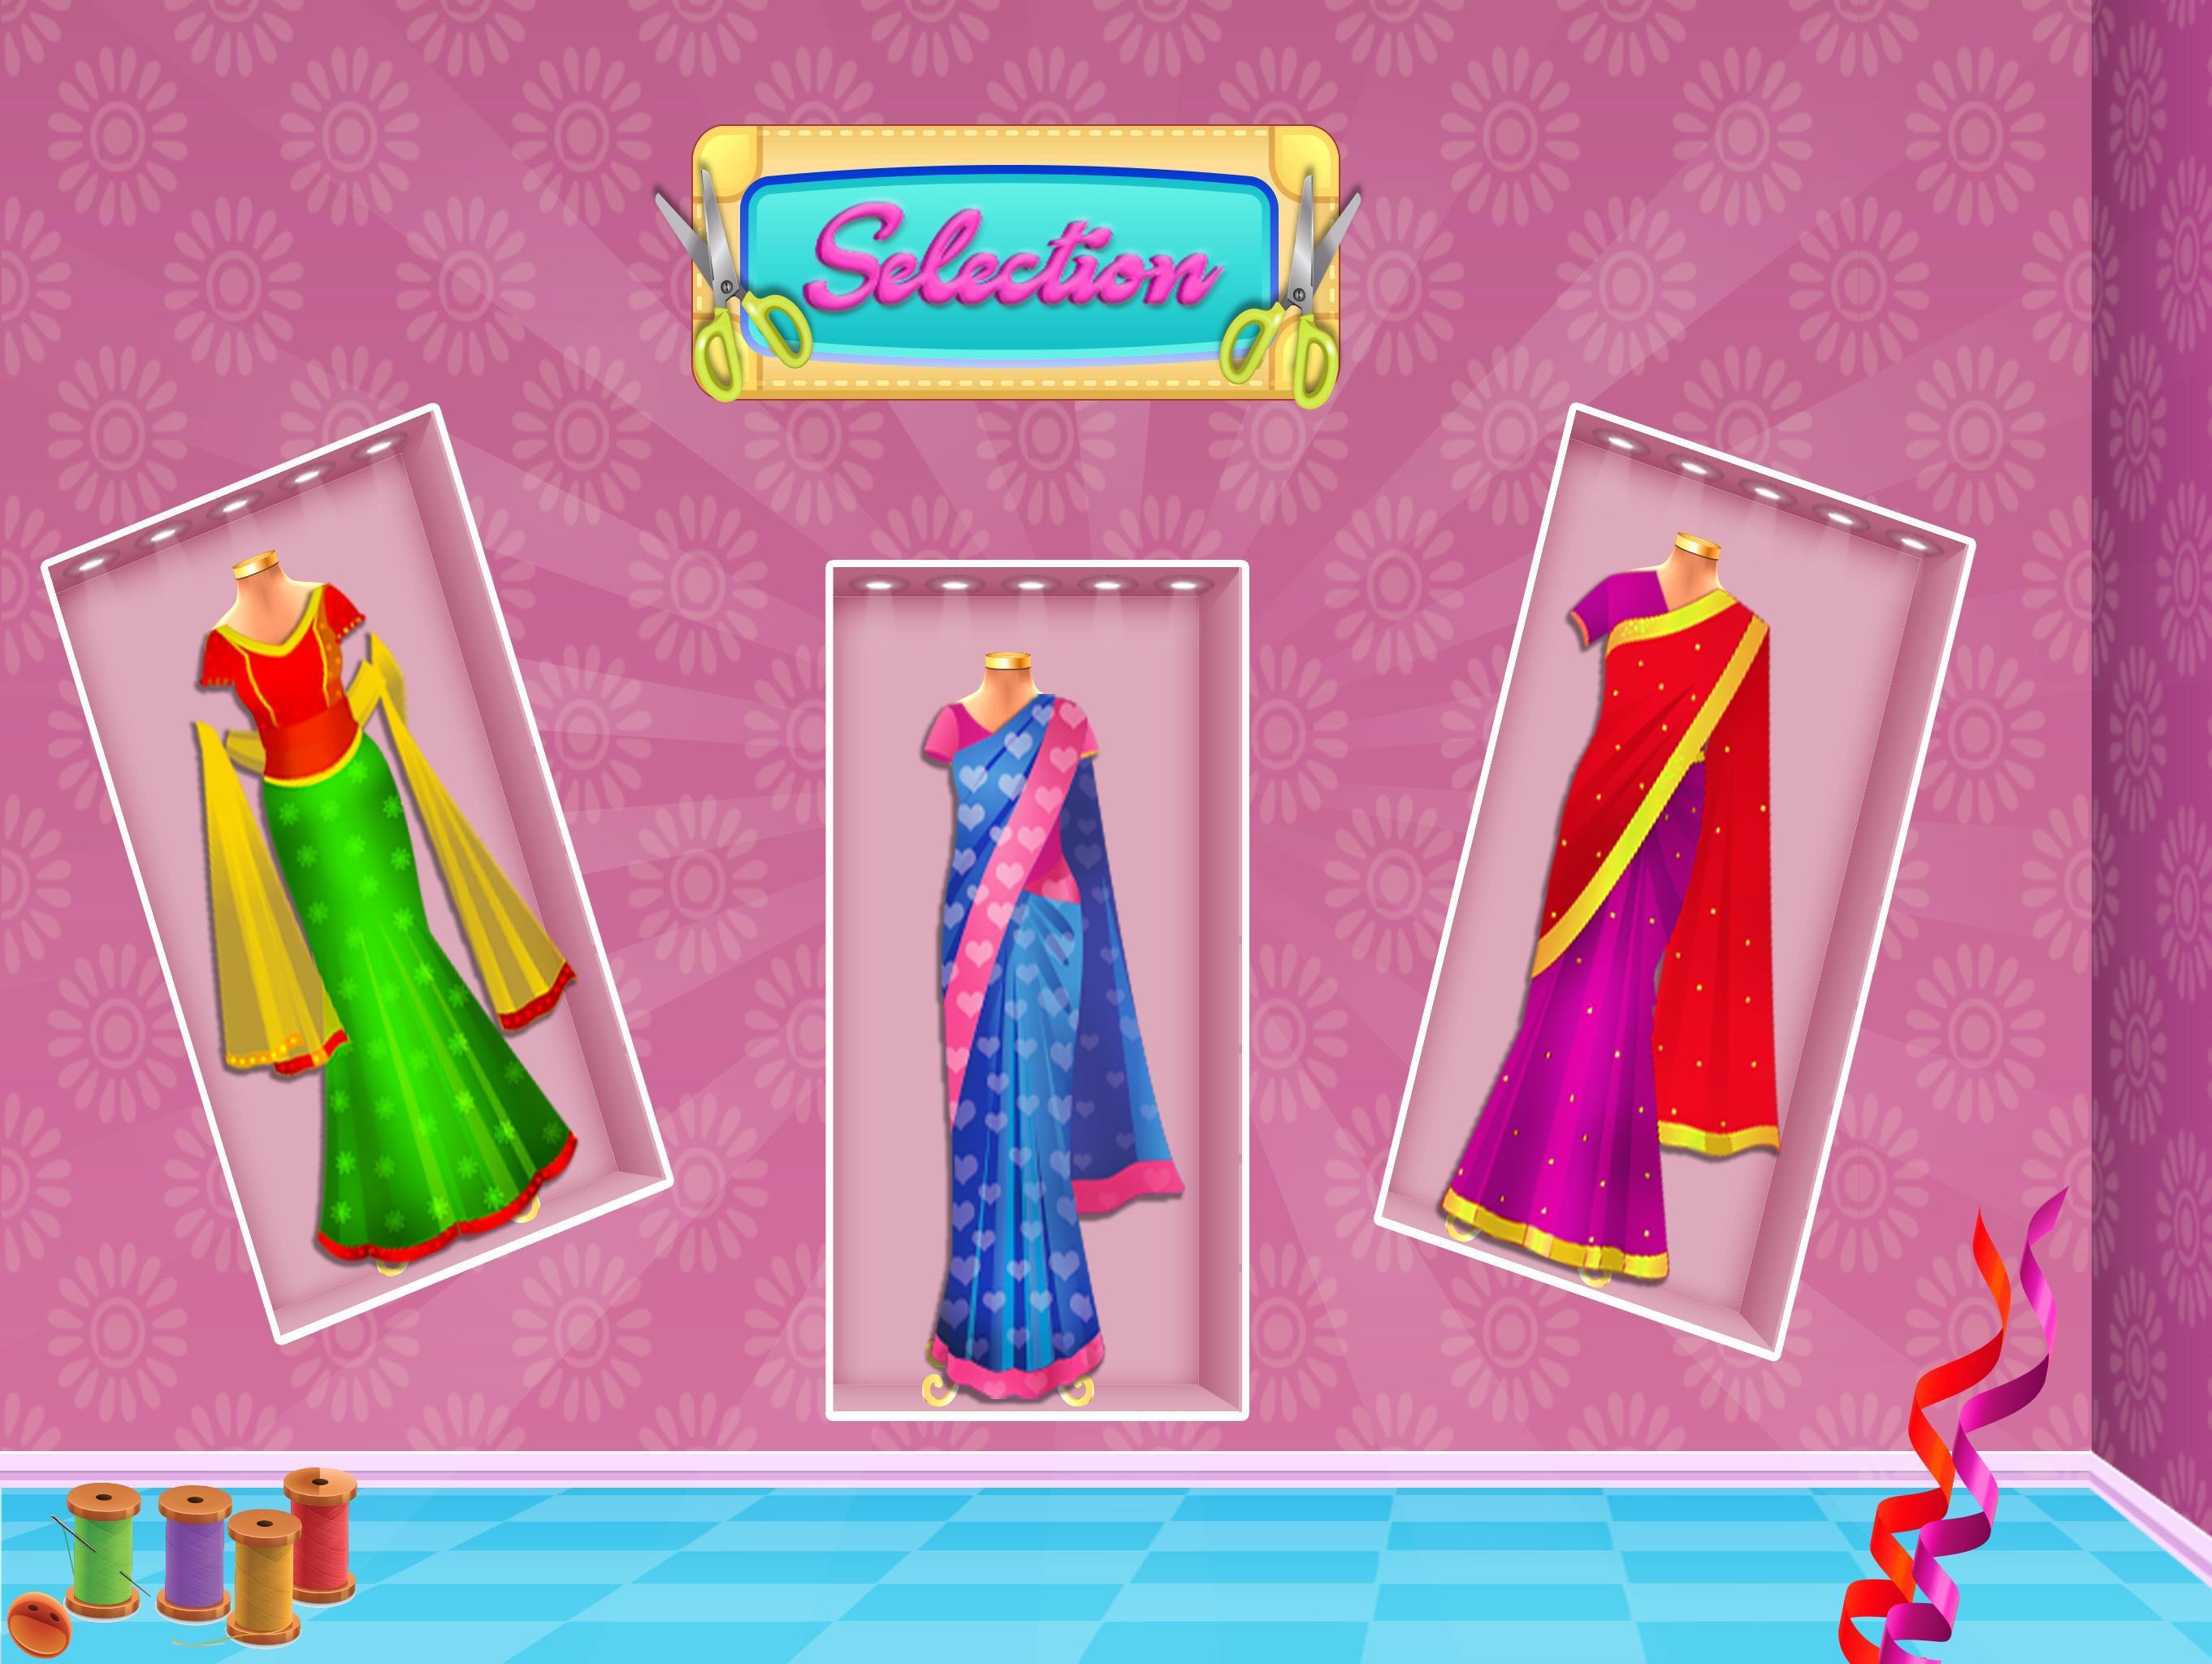 Indian Wedding Dress Tailor Little Style Boutique 1.0.4 Screenshot 16